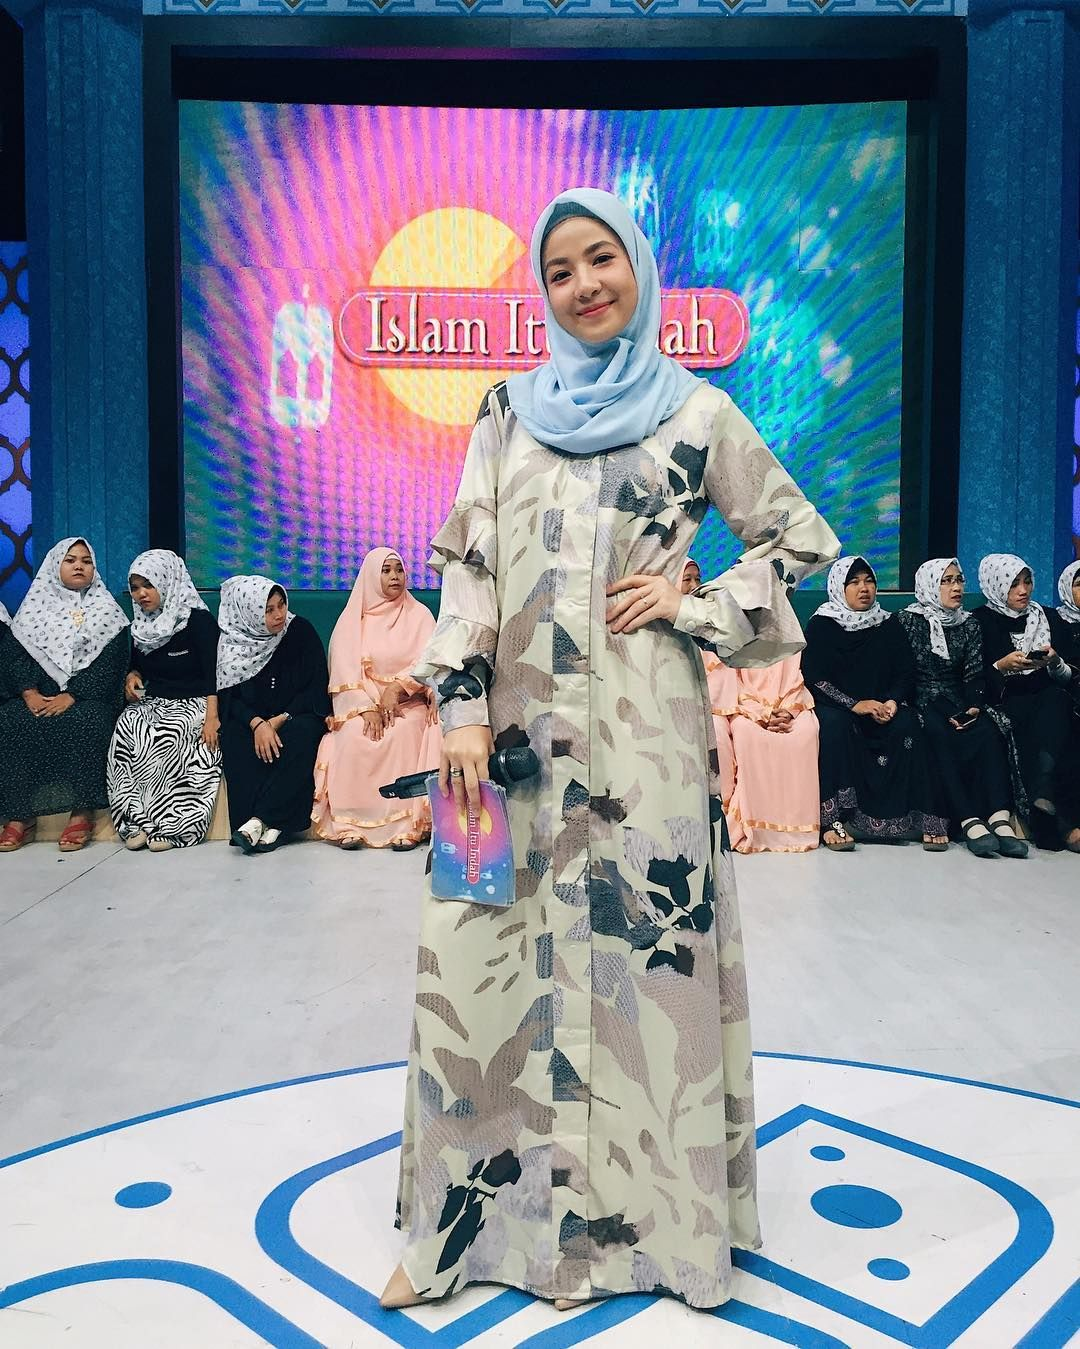 Outfit Baju Remaja Berhijab Ala Selebgram 2018 Hijab Segi Empat Biru